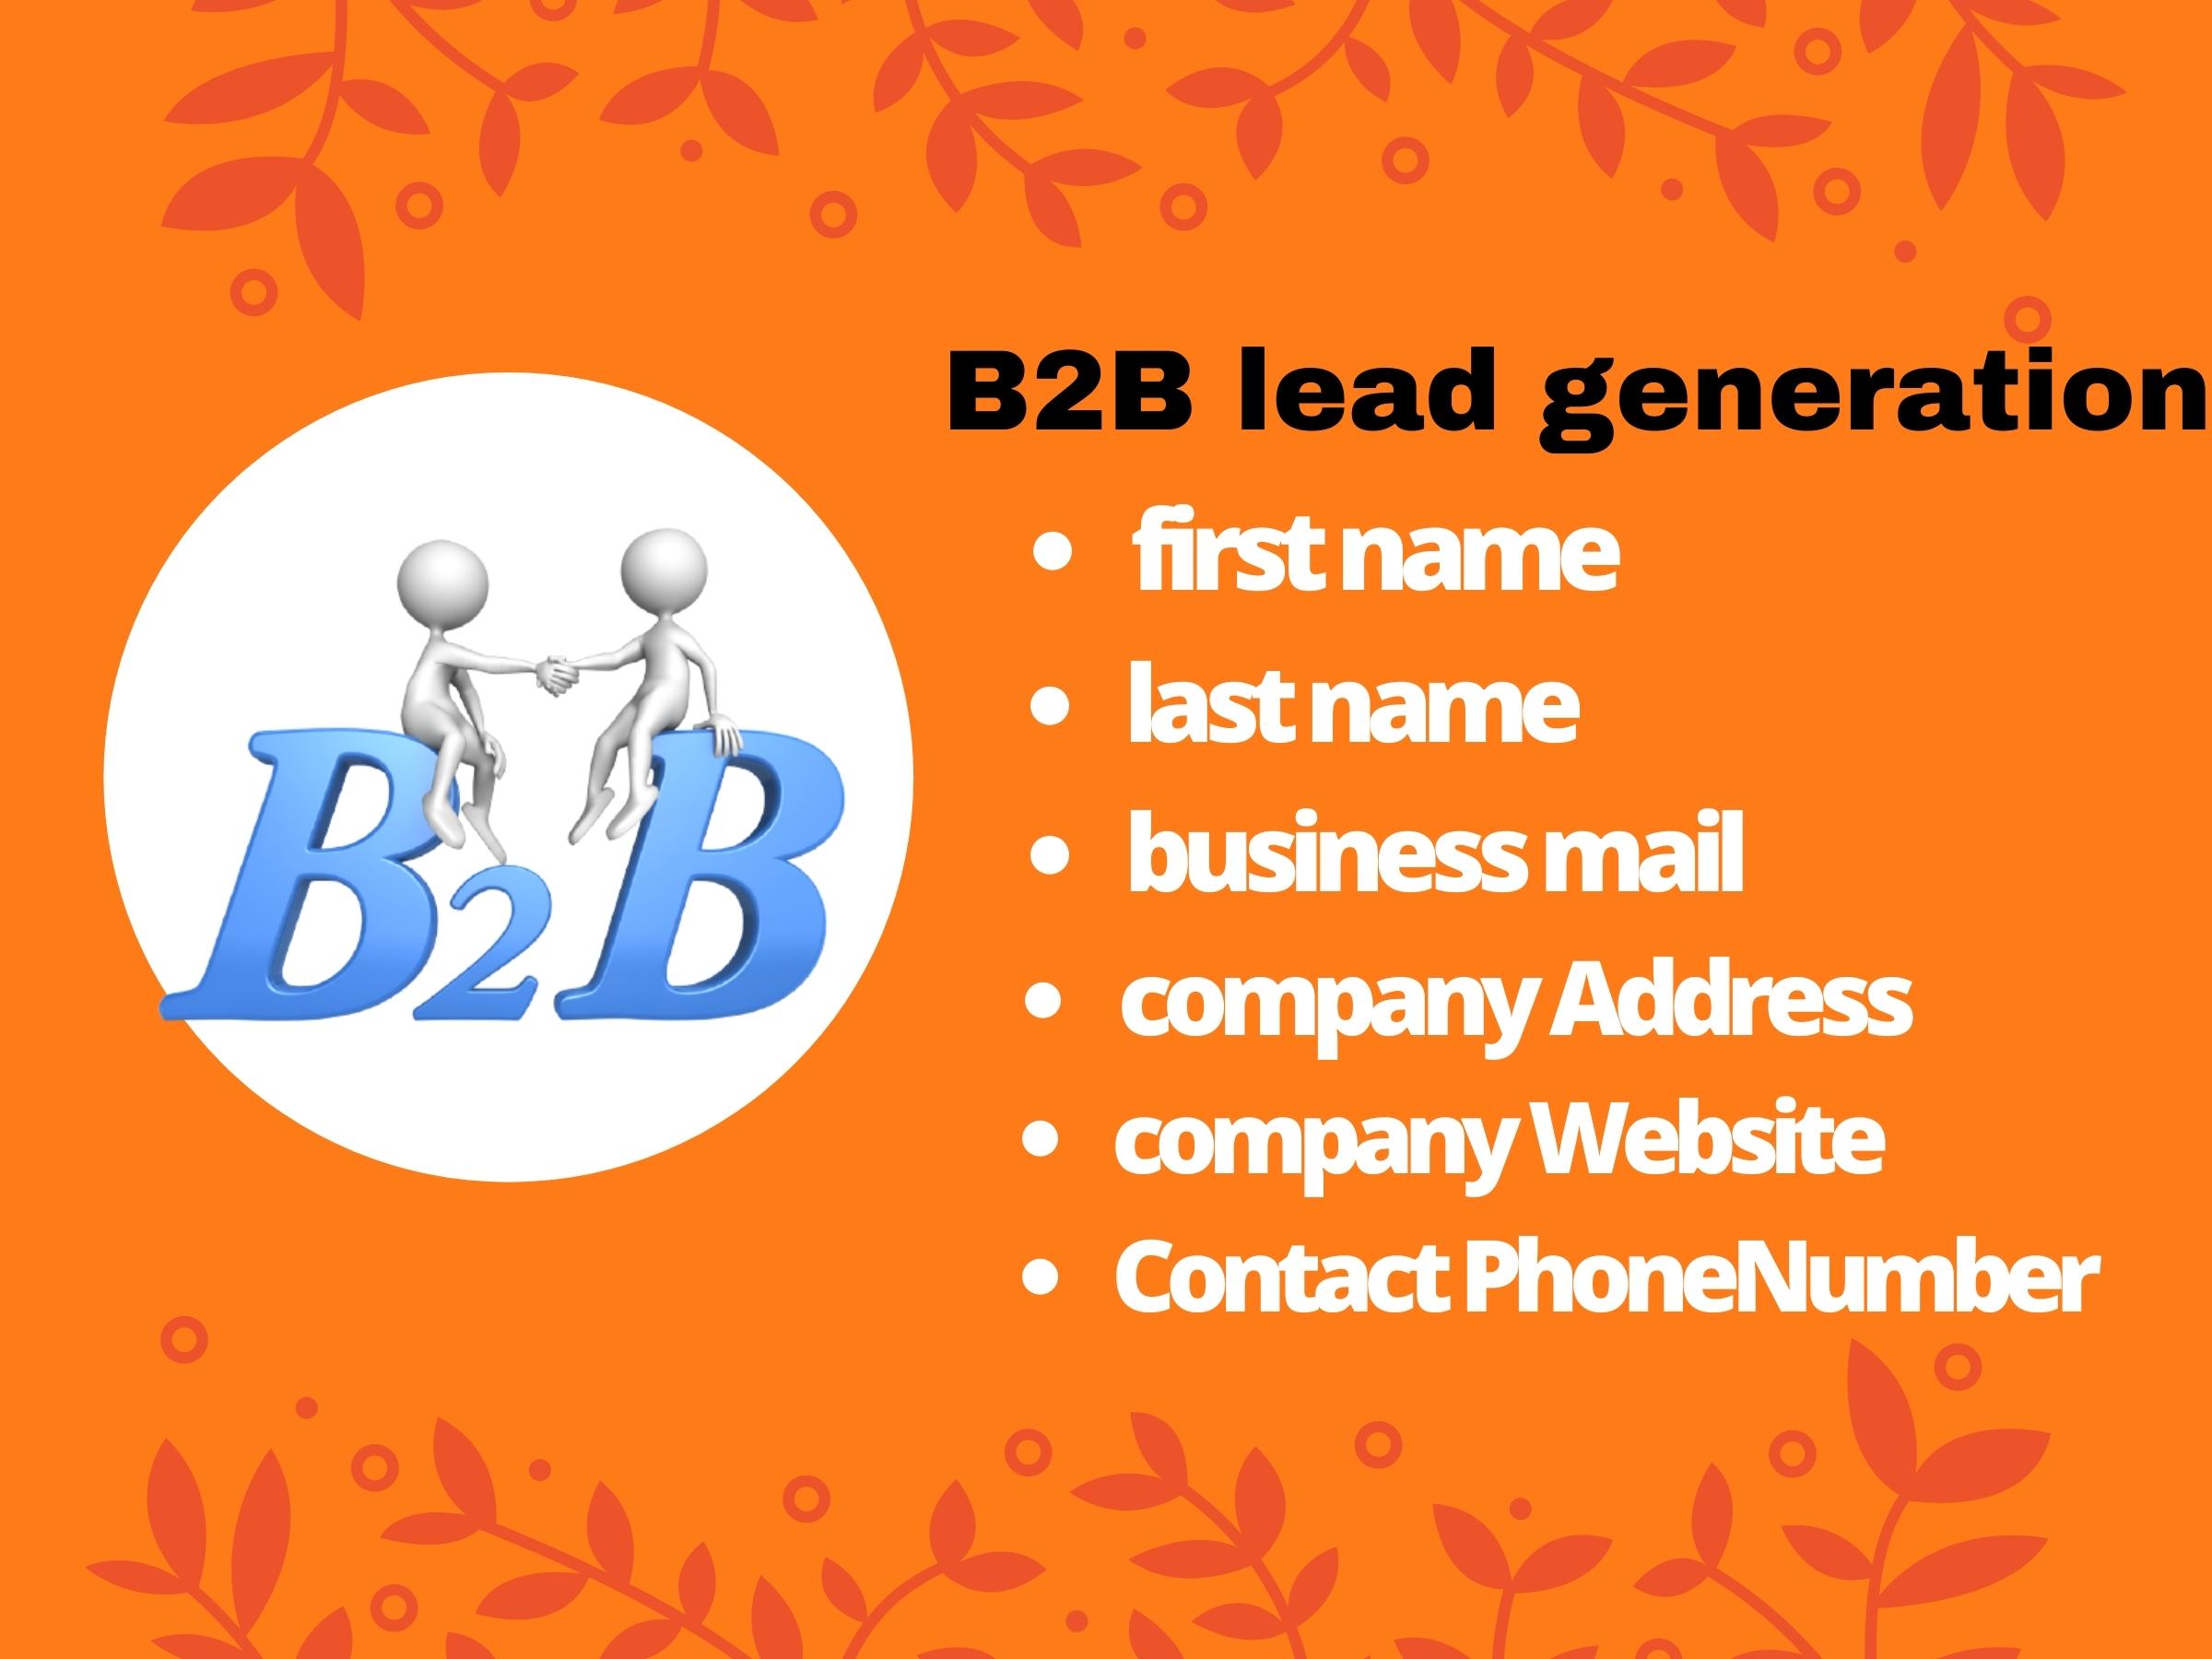 I will do 55 targeted Linkedin B2B lead generation